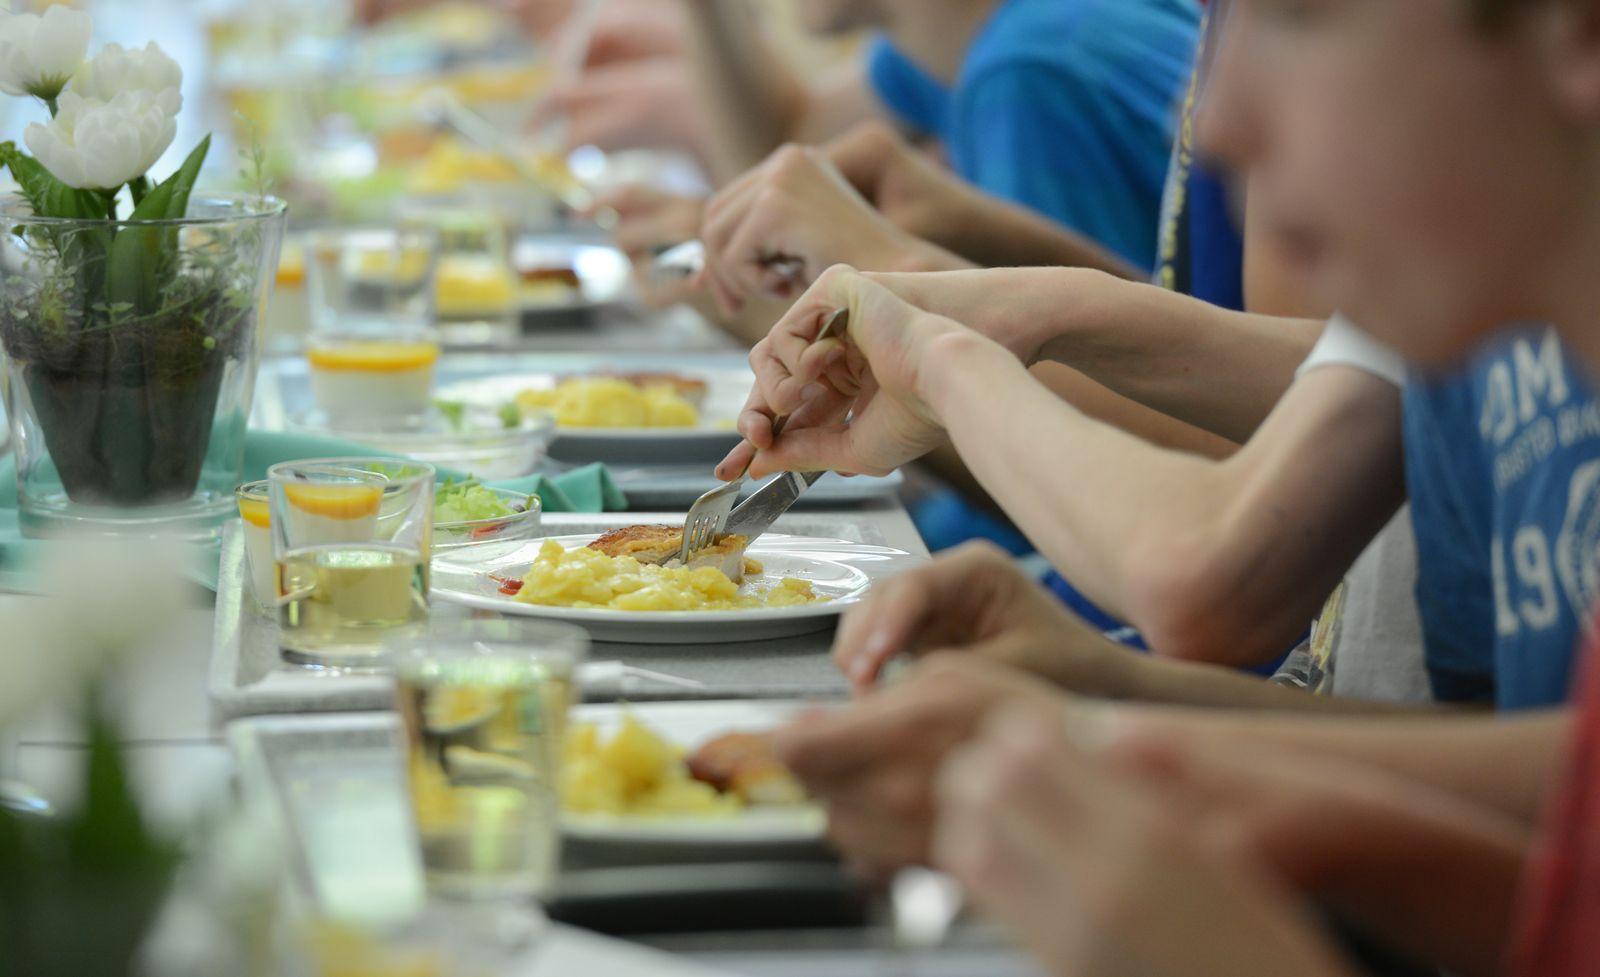 schlechtes Essen an den Schulen / Mittagessen Ganztageschule